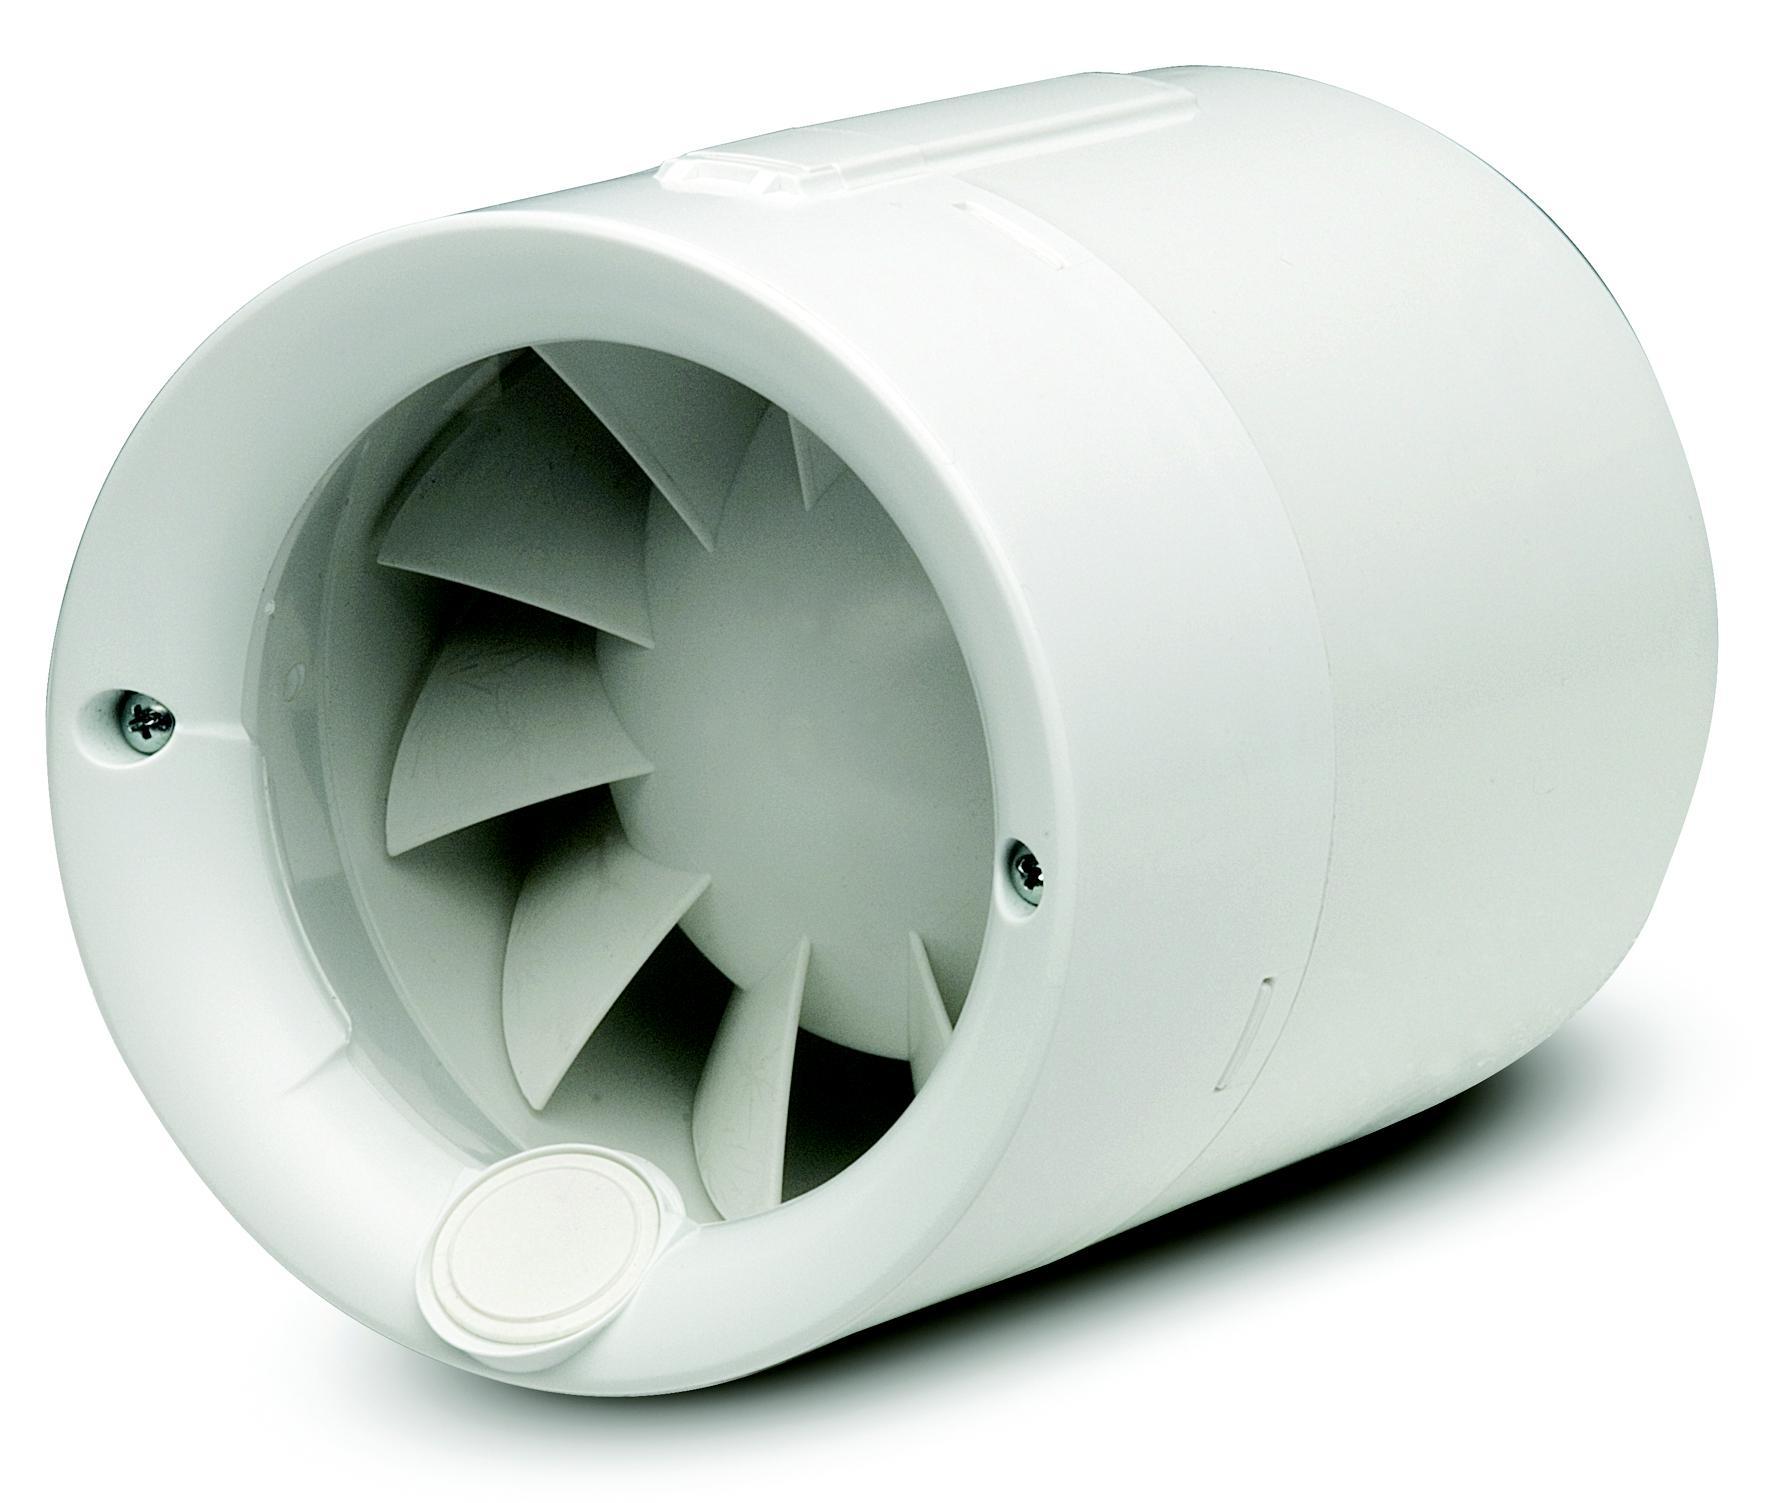 Вентилятор Soler&palau Silentub-200